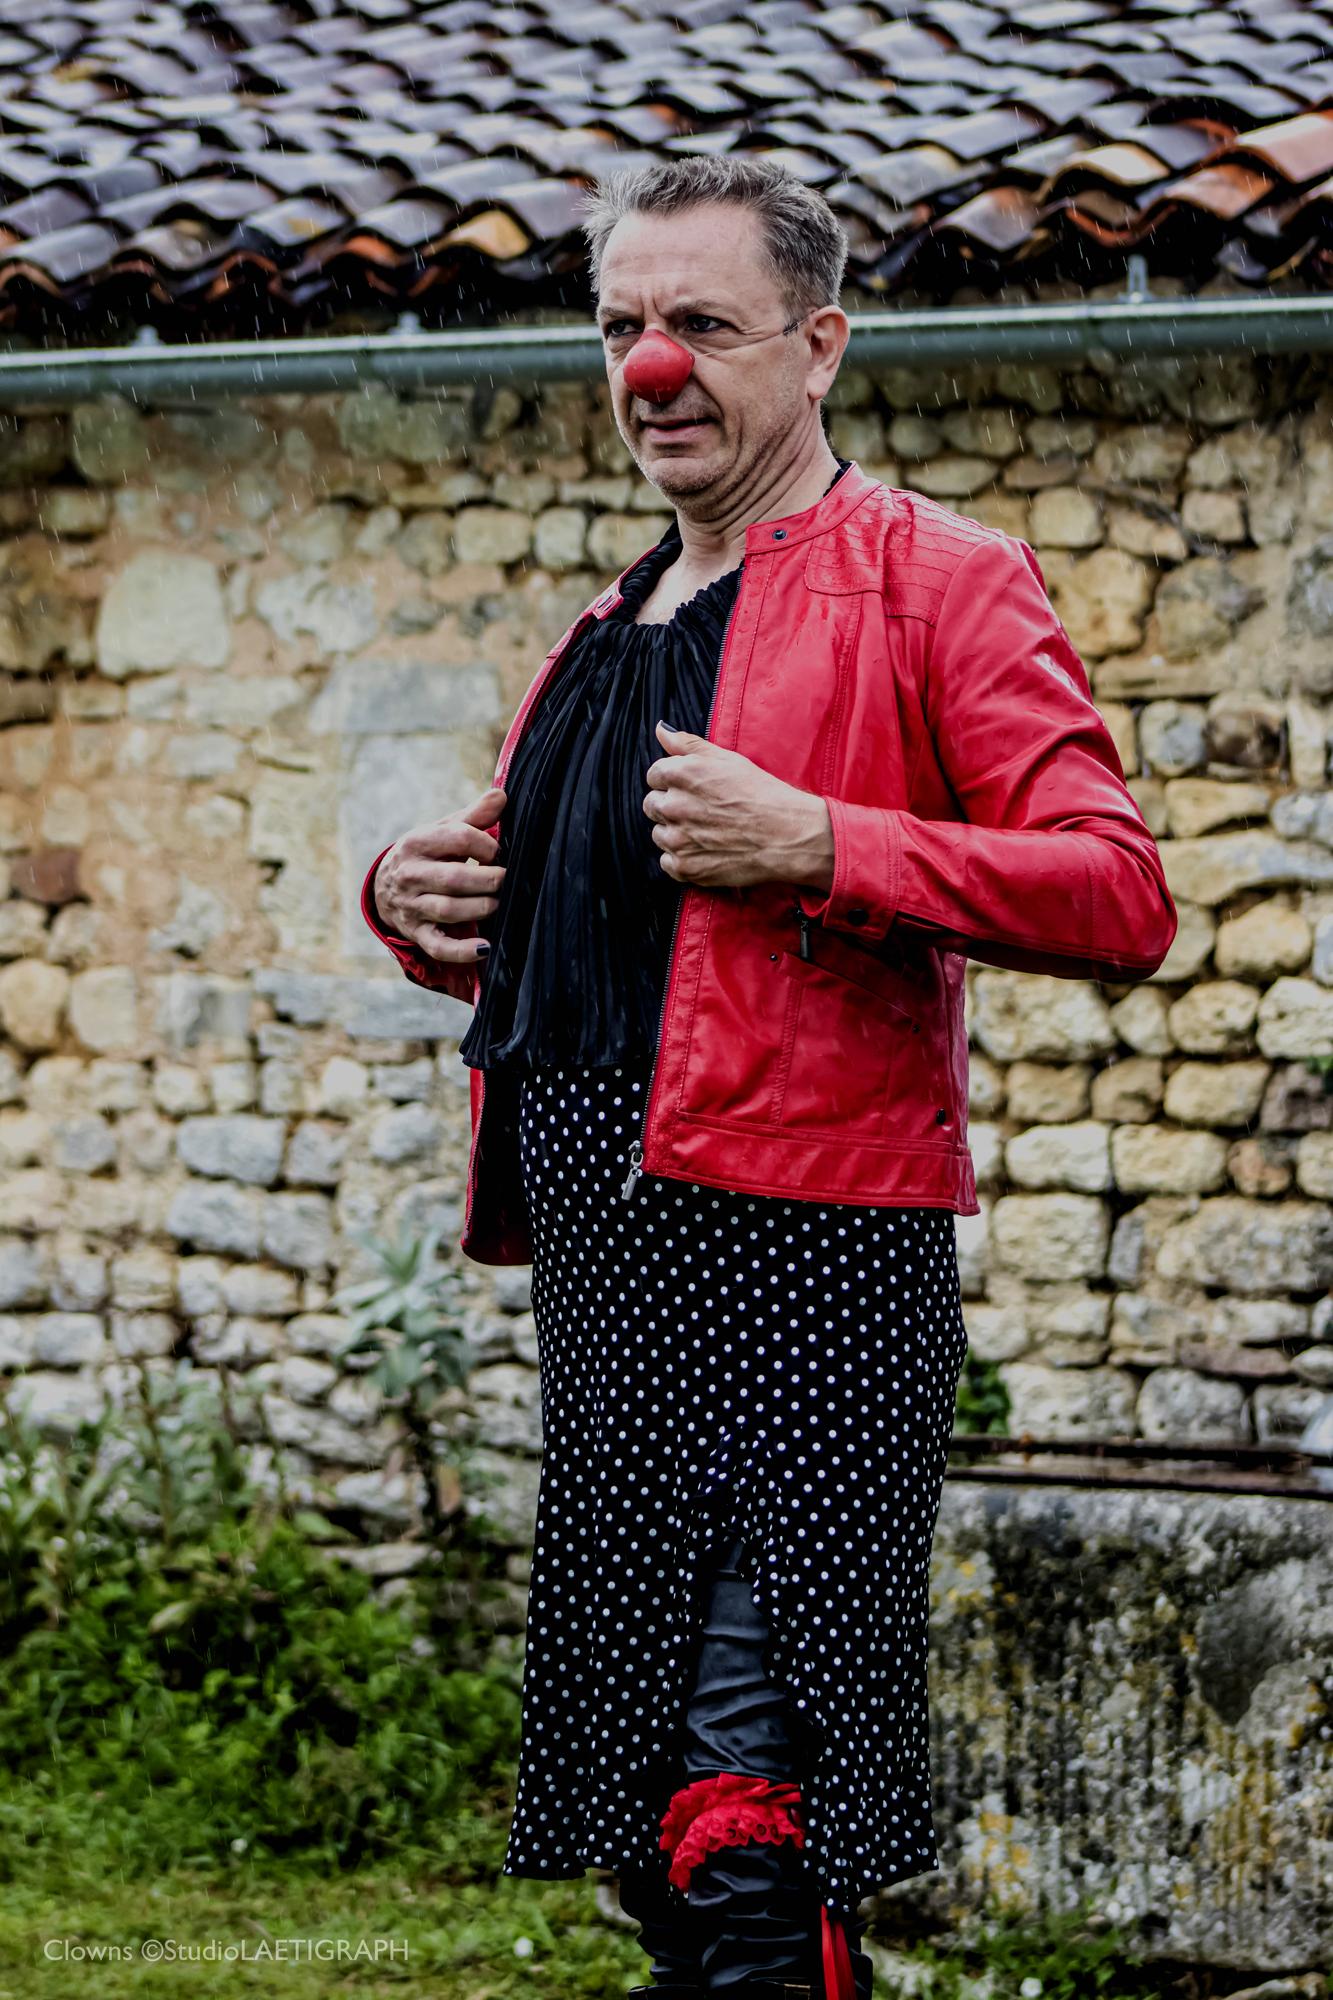 LMDCB21_clowns-36_1